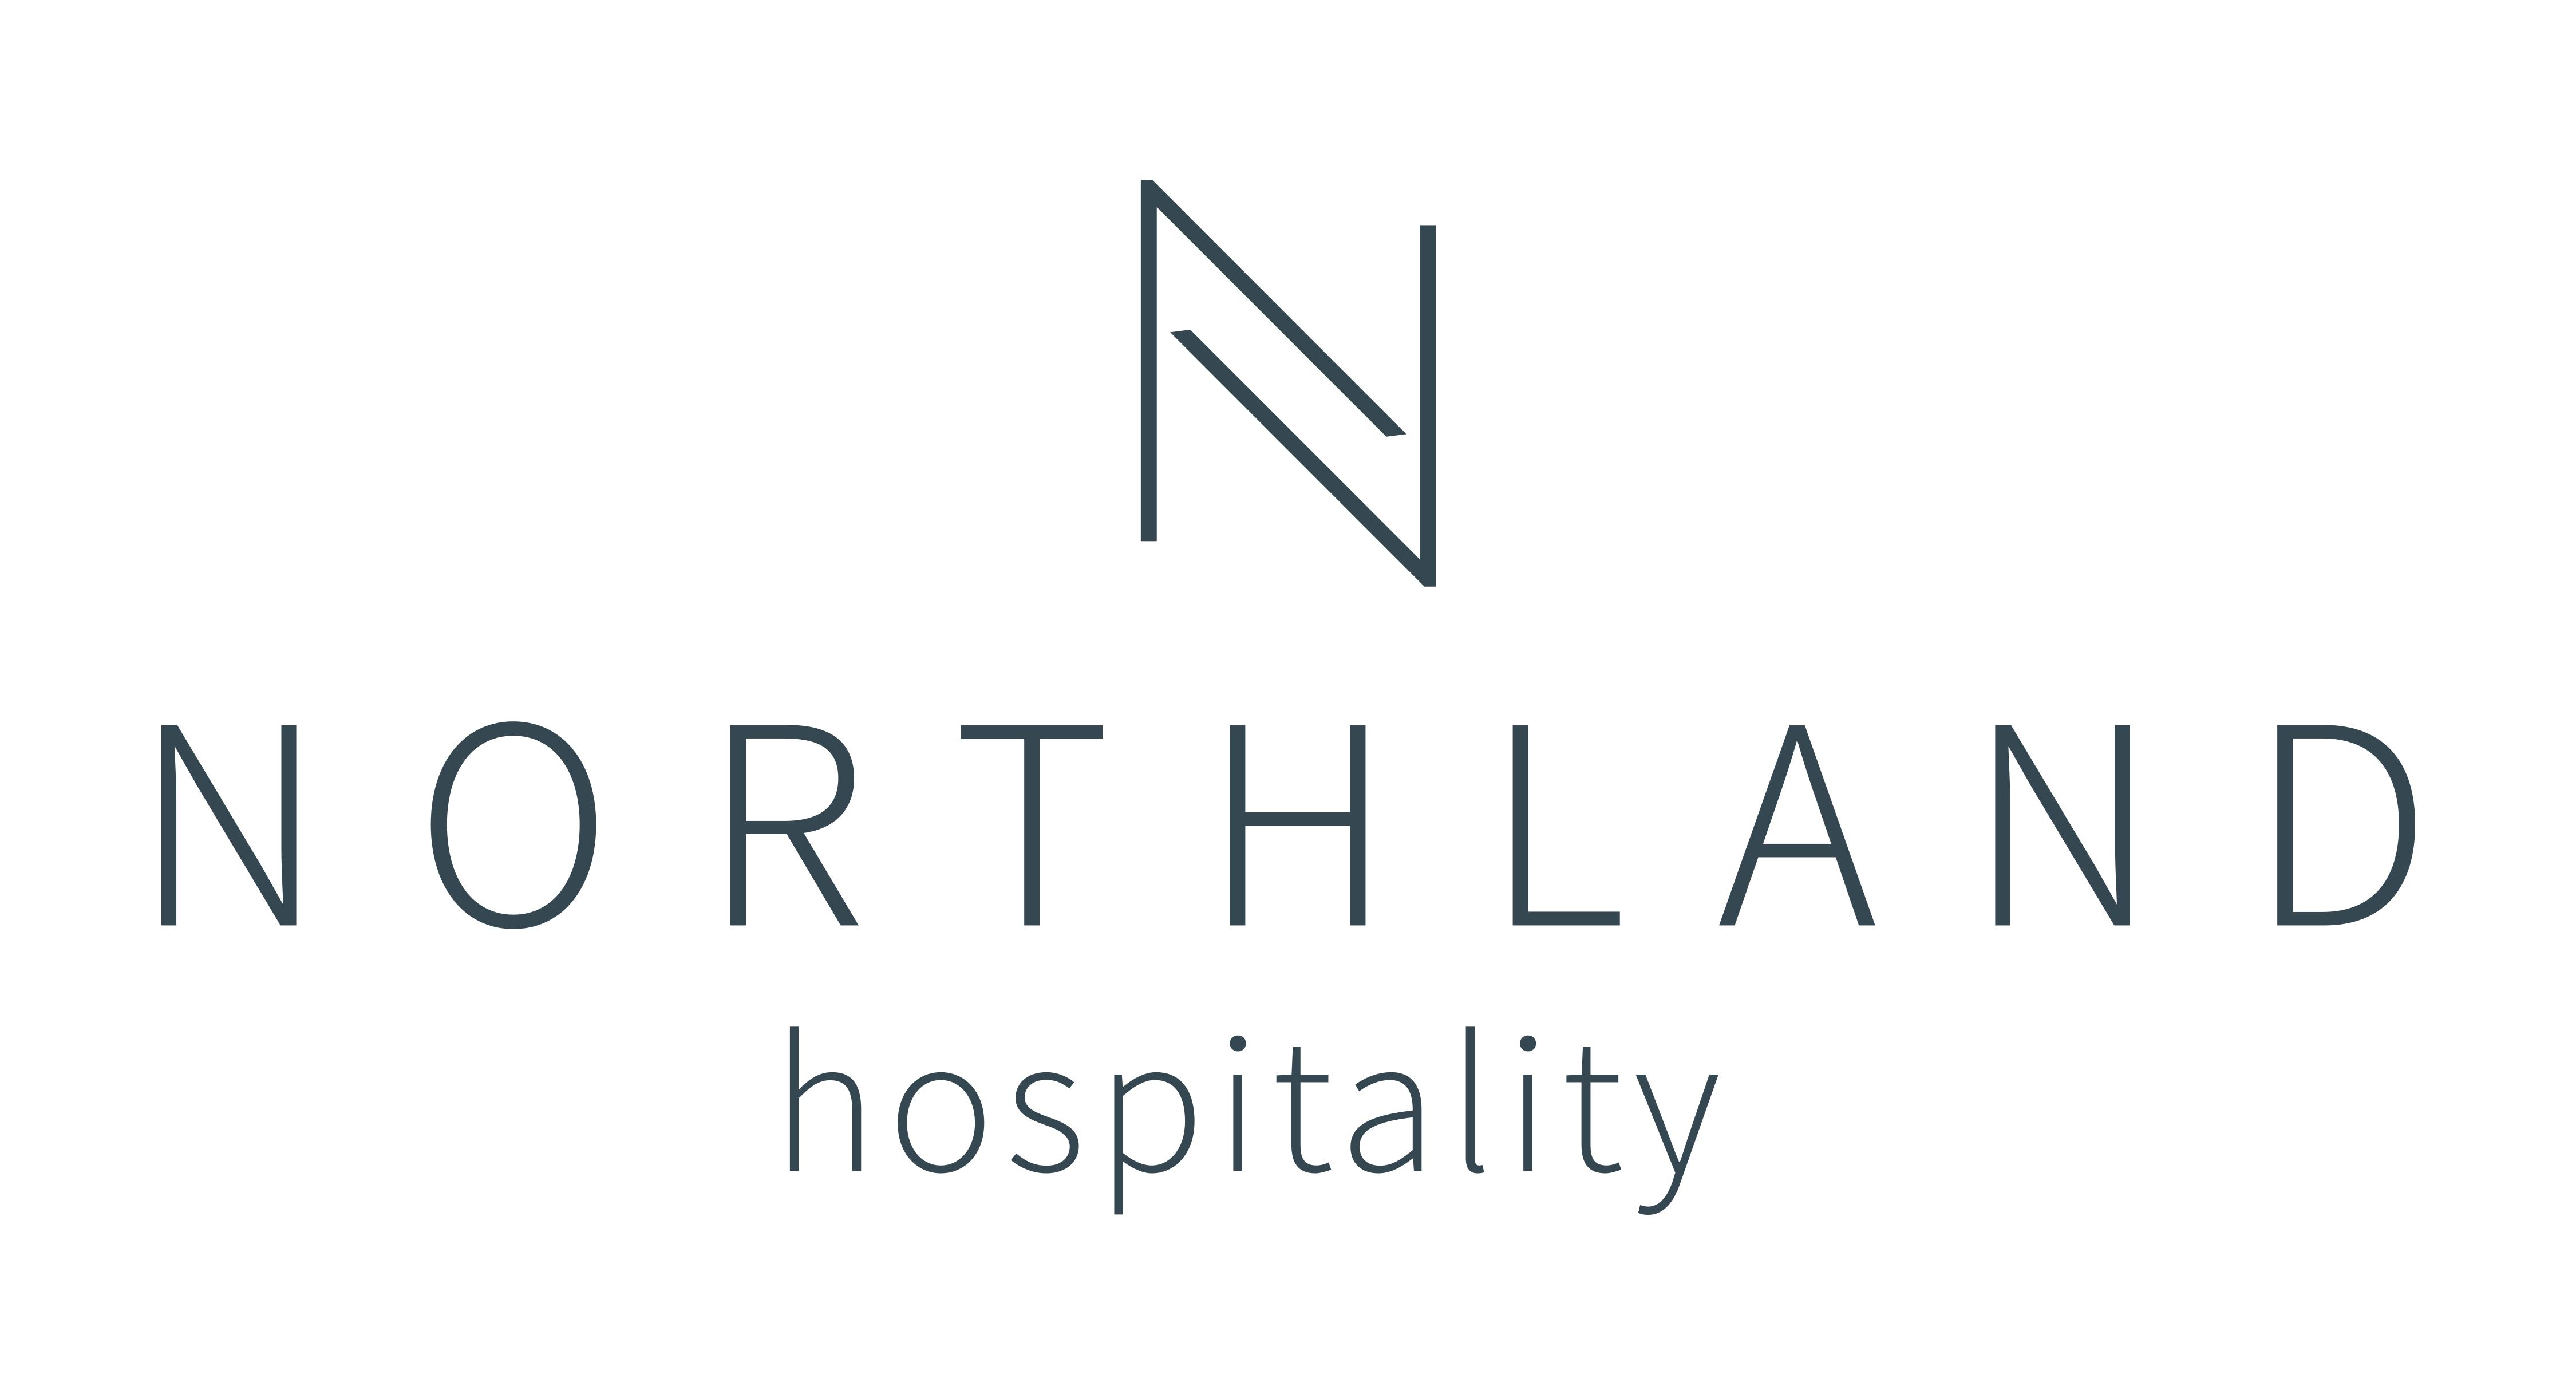 Northland-logo-tagline-hospitality